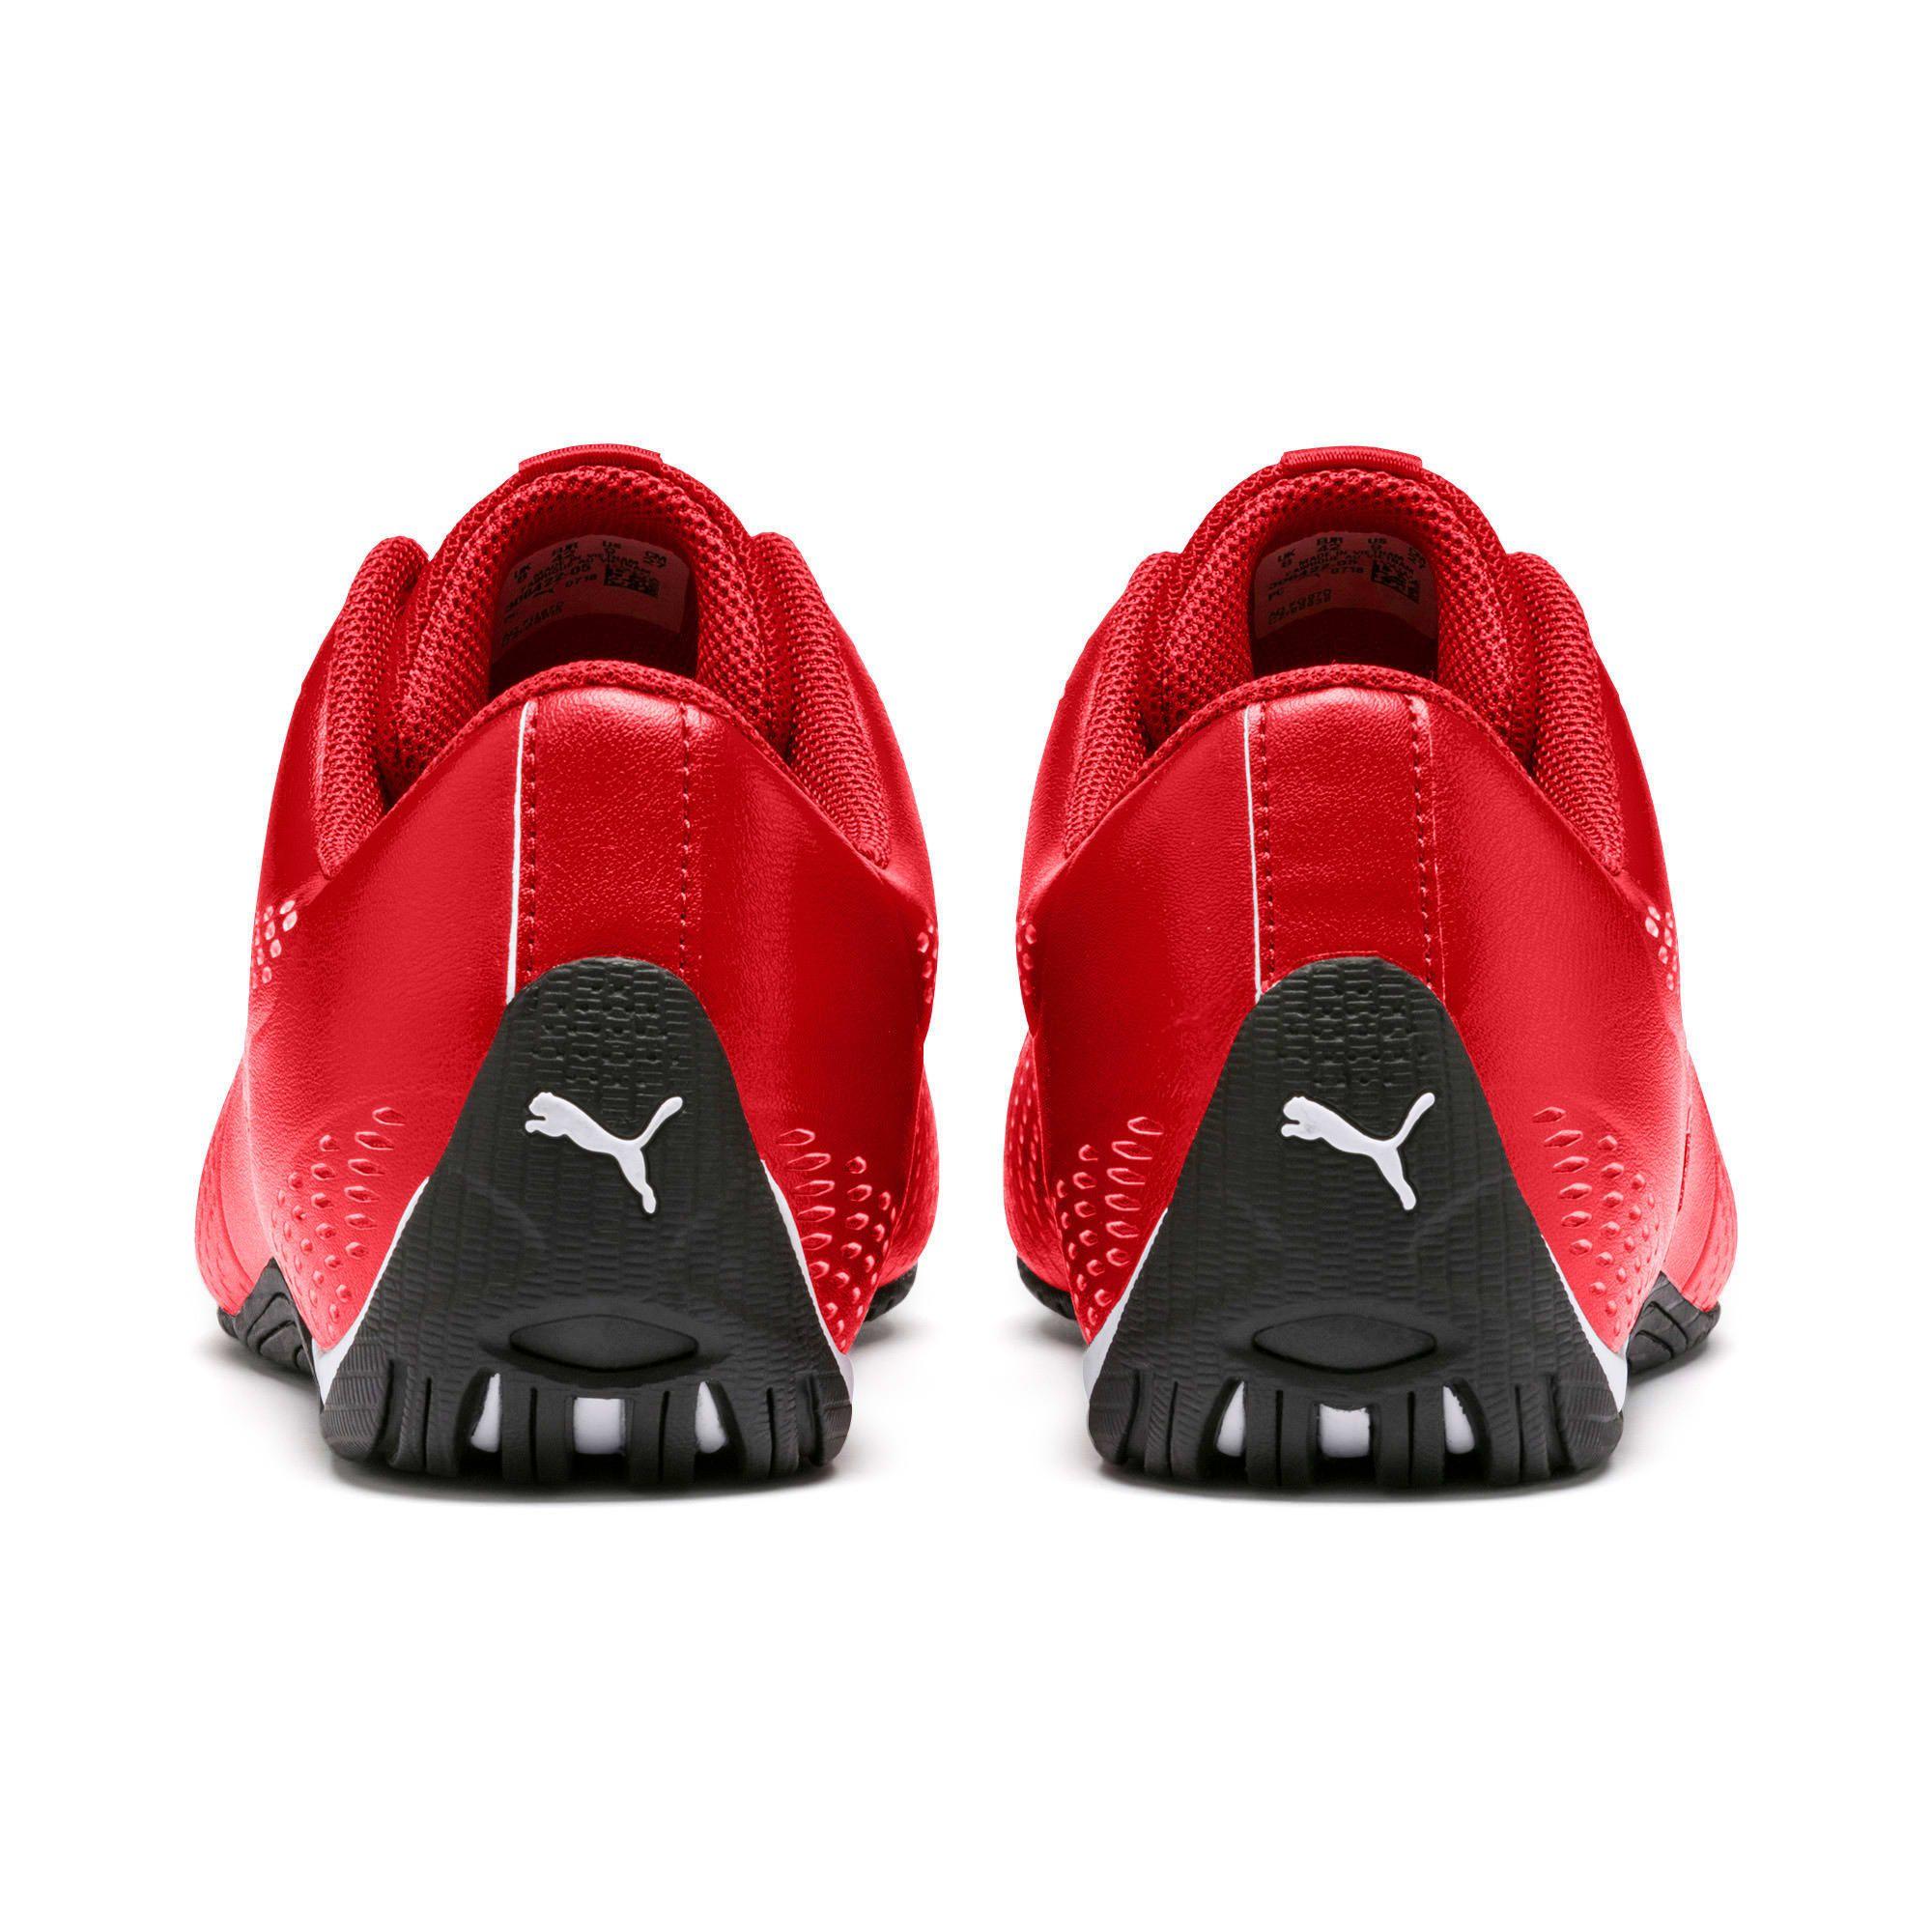 PUMA Ferrari Drift Cat 5 Ultra II Trainers, Red, size 9.5, Clothing